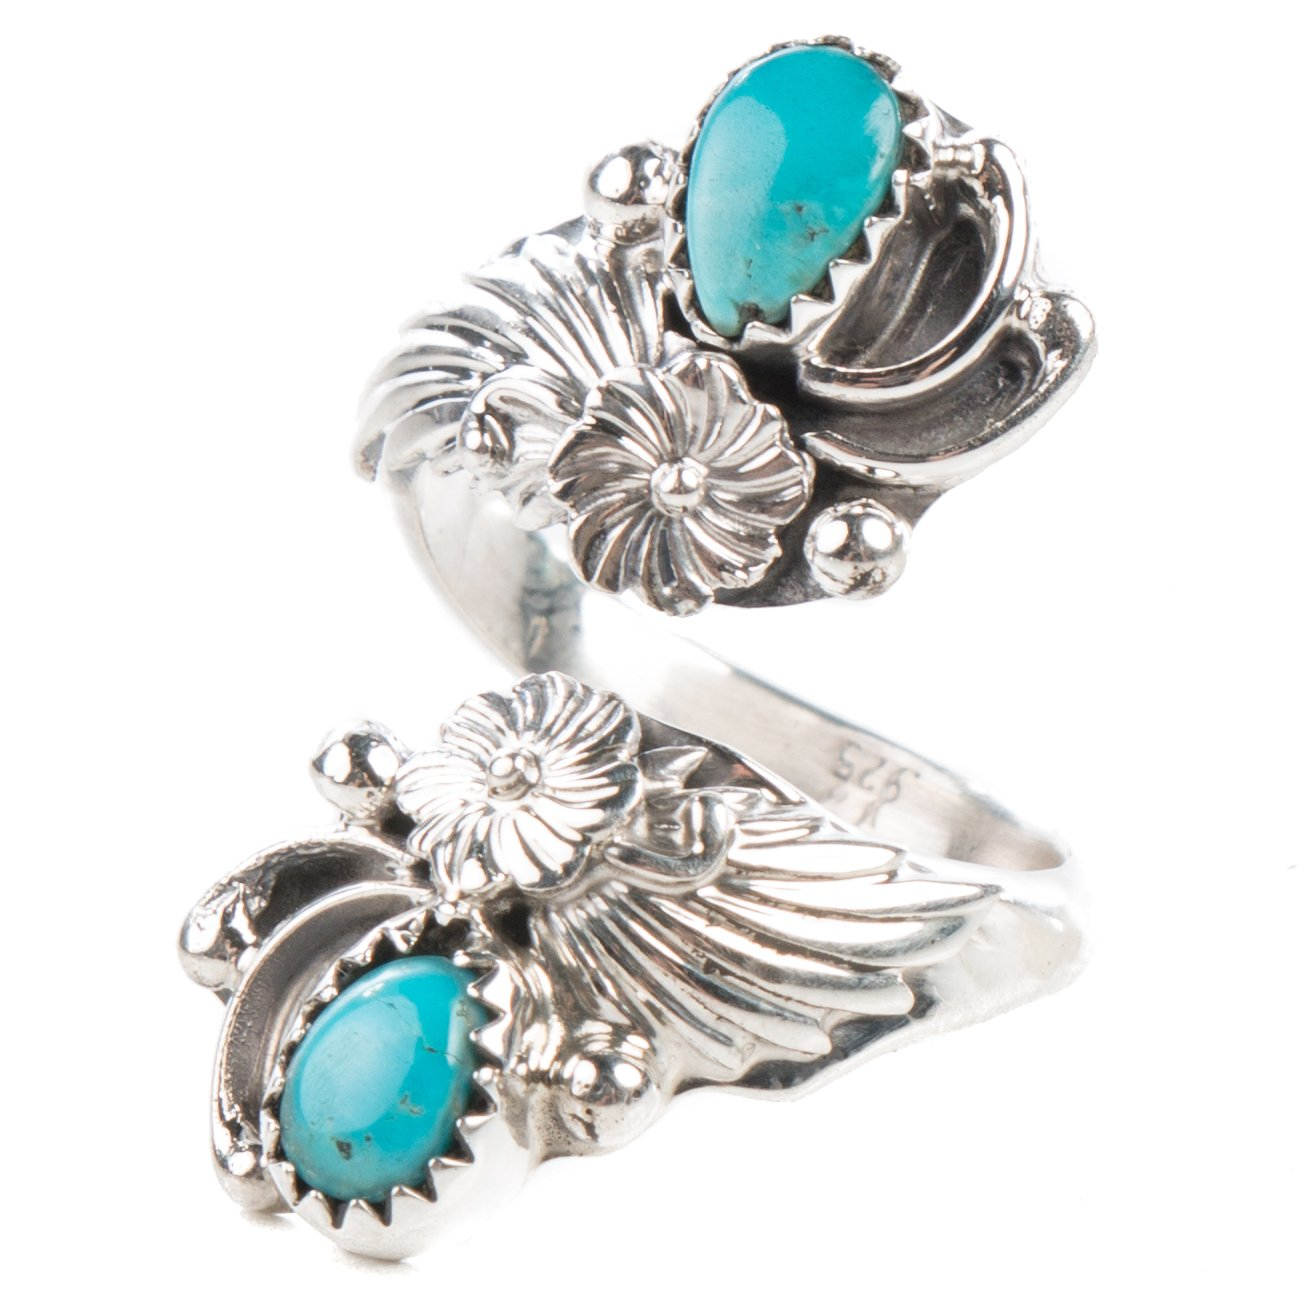 TSKIES Handmade Navajo Turquoise Sterling Silver Adjustable Ring Native American Jewelry